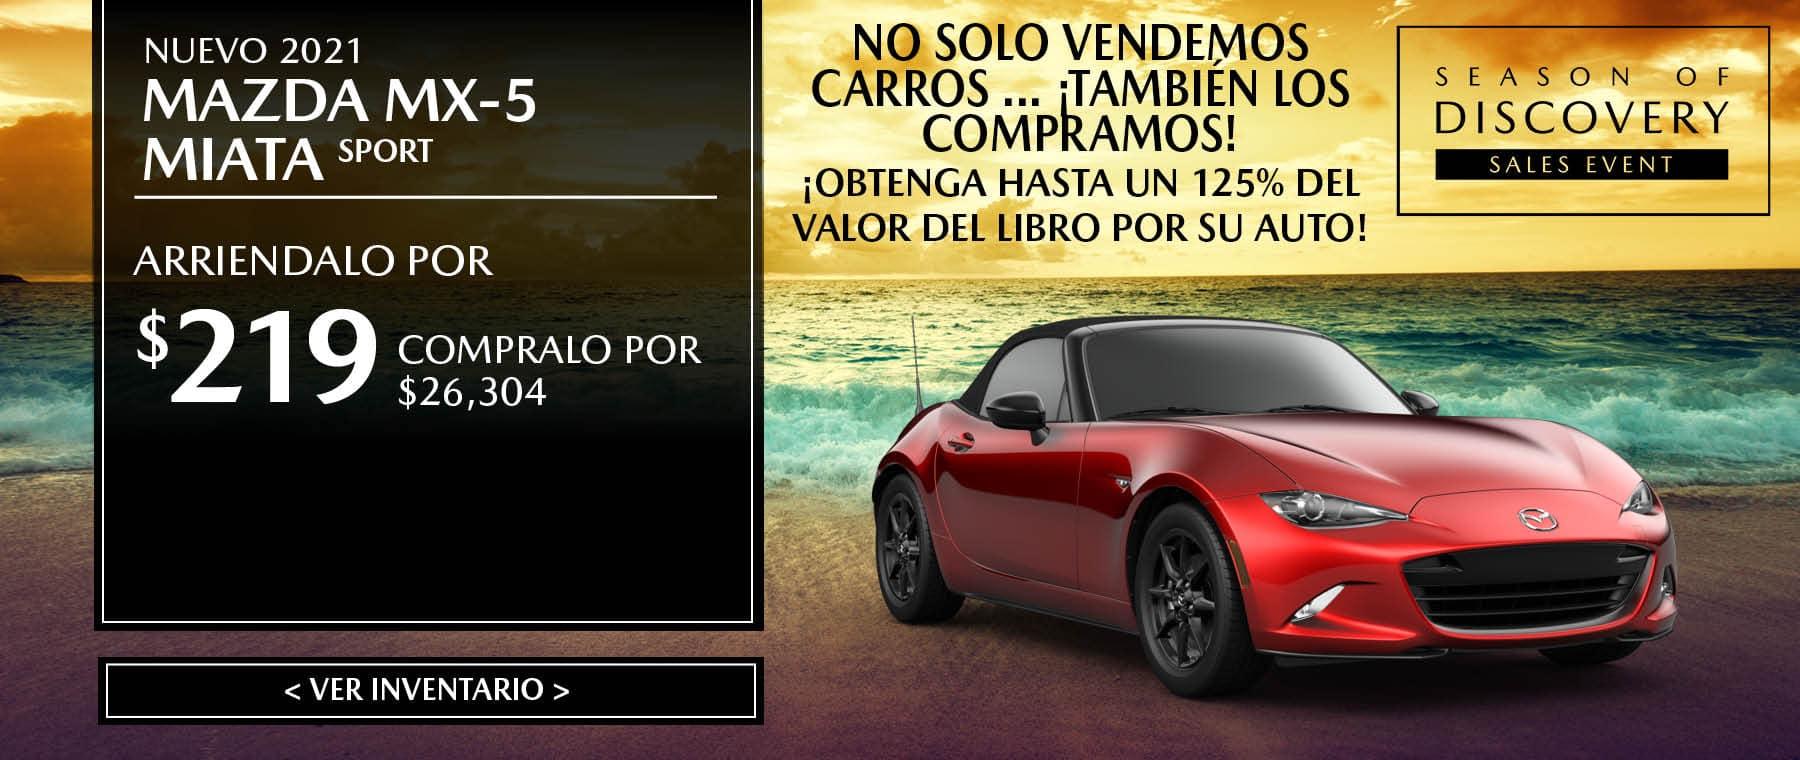 6.3.2021_MX5MIATASport_Spanish